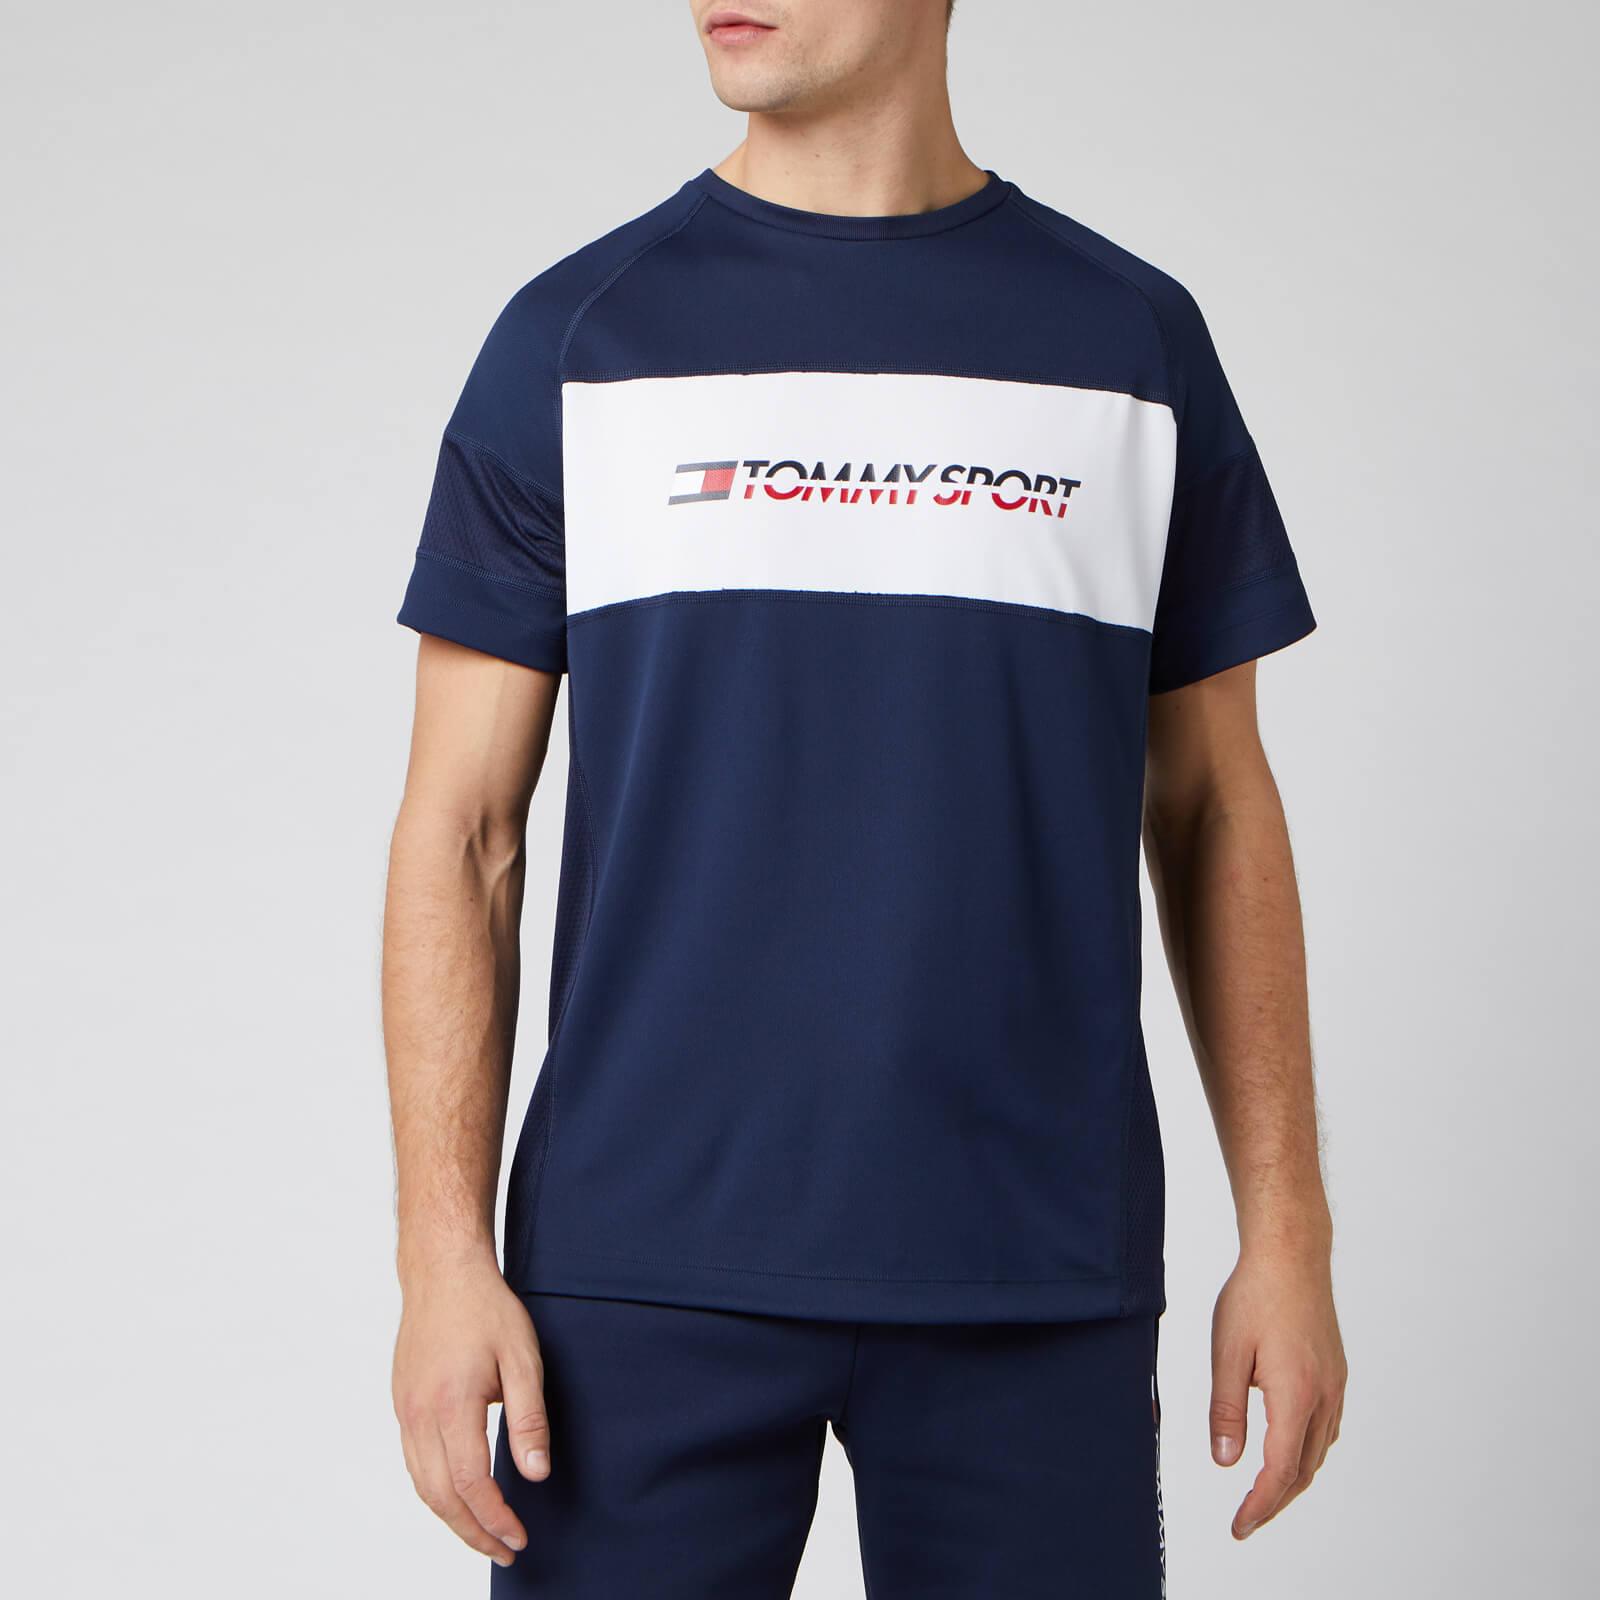 Tommy Sport Men's Performance Mesh Short Sleeve T-Shirt - Sport Navy - XL